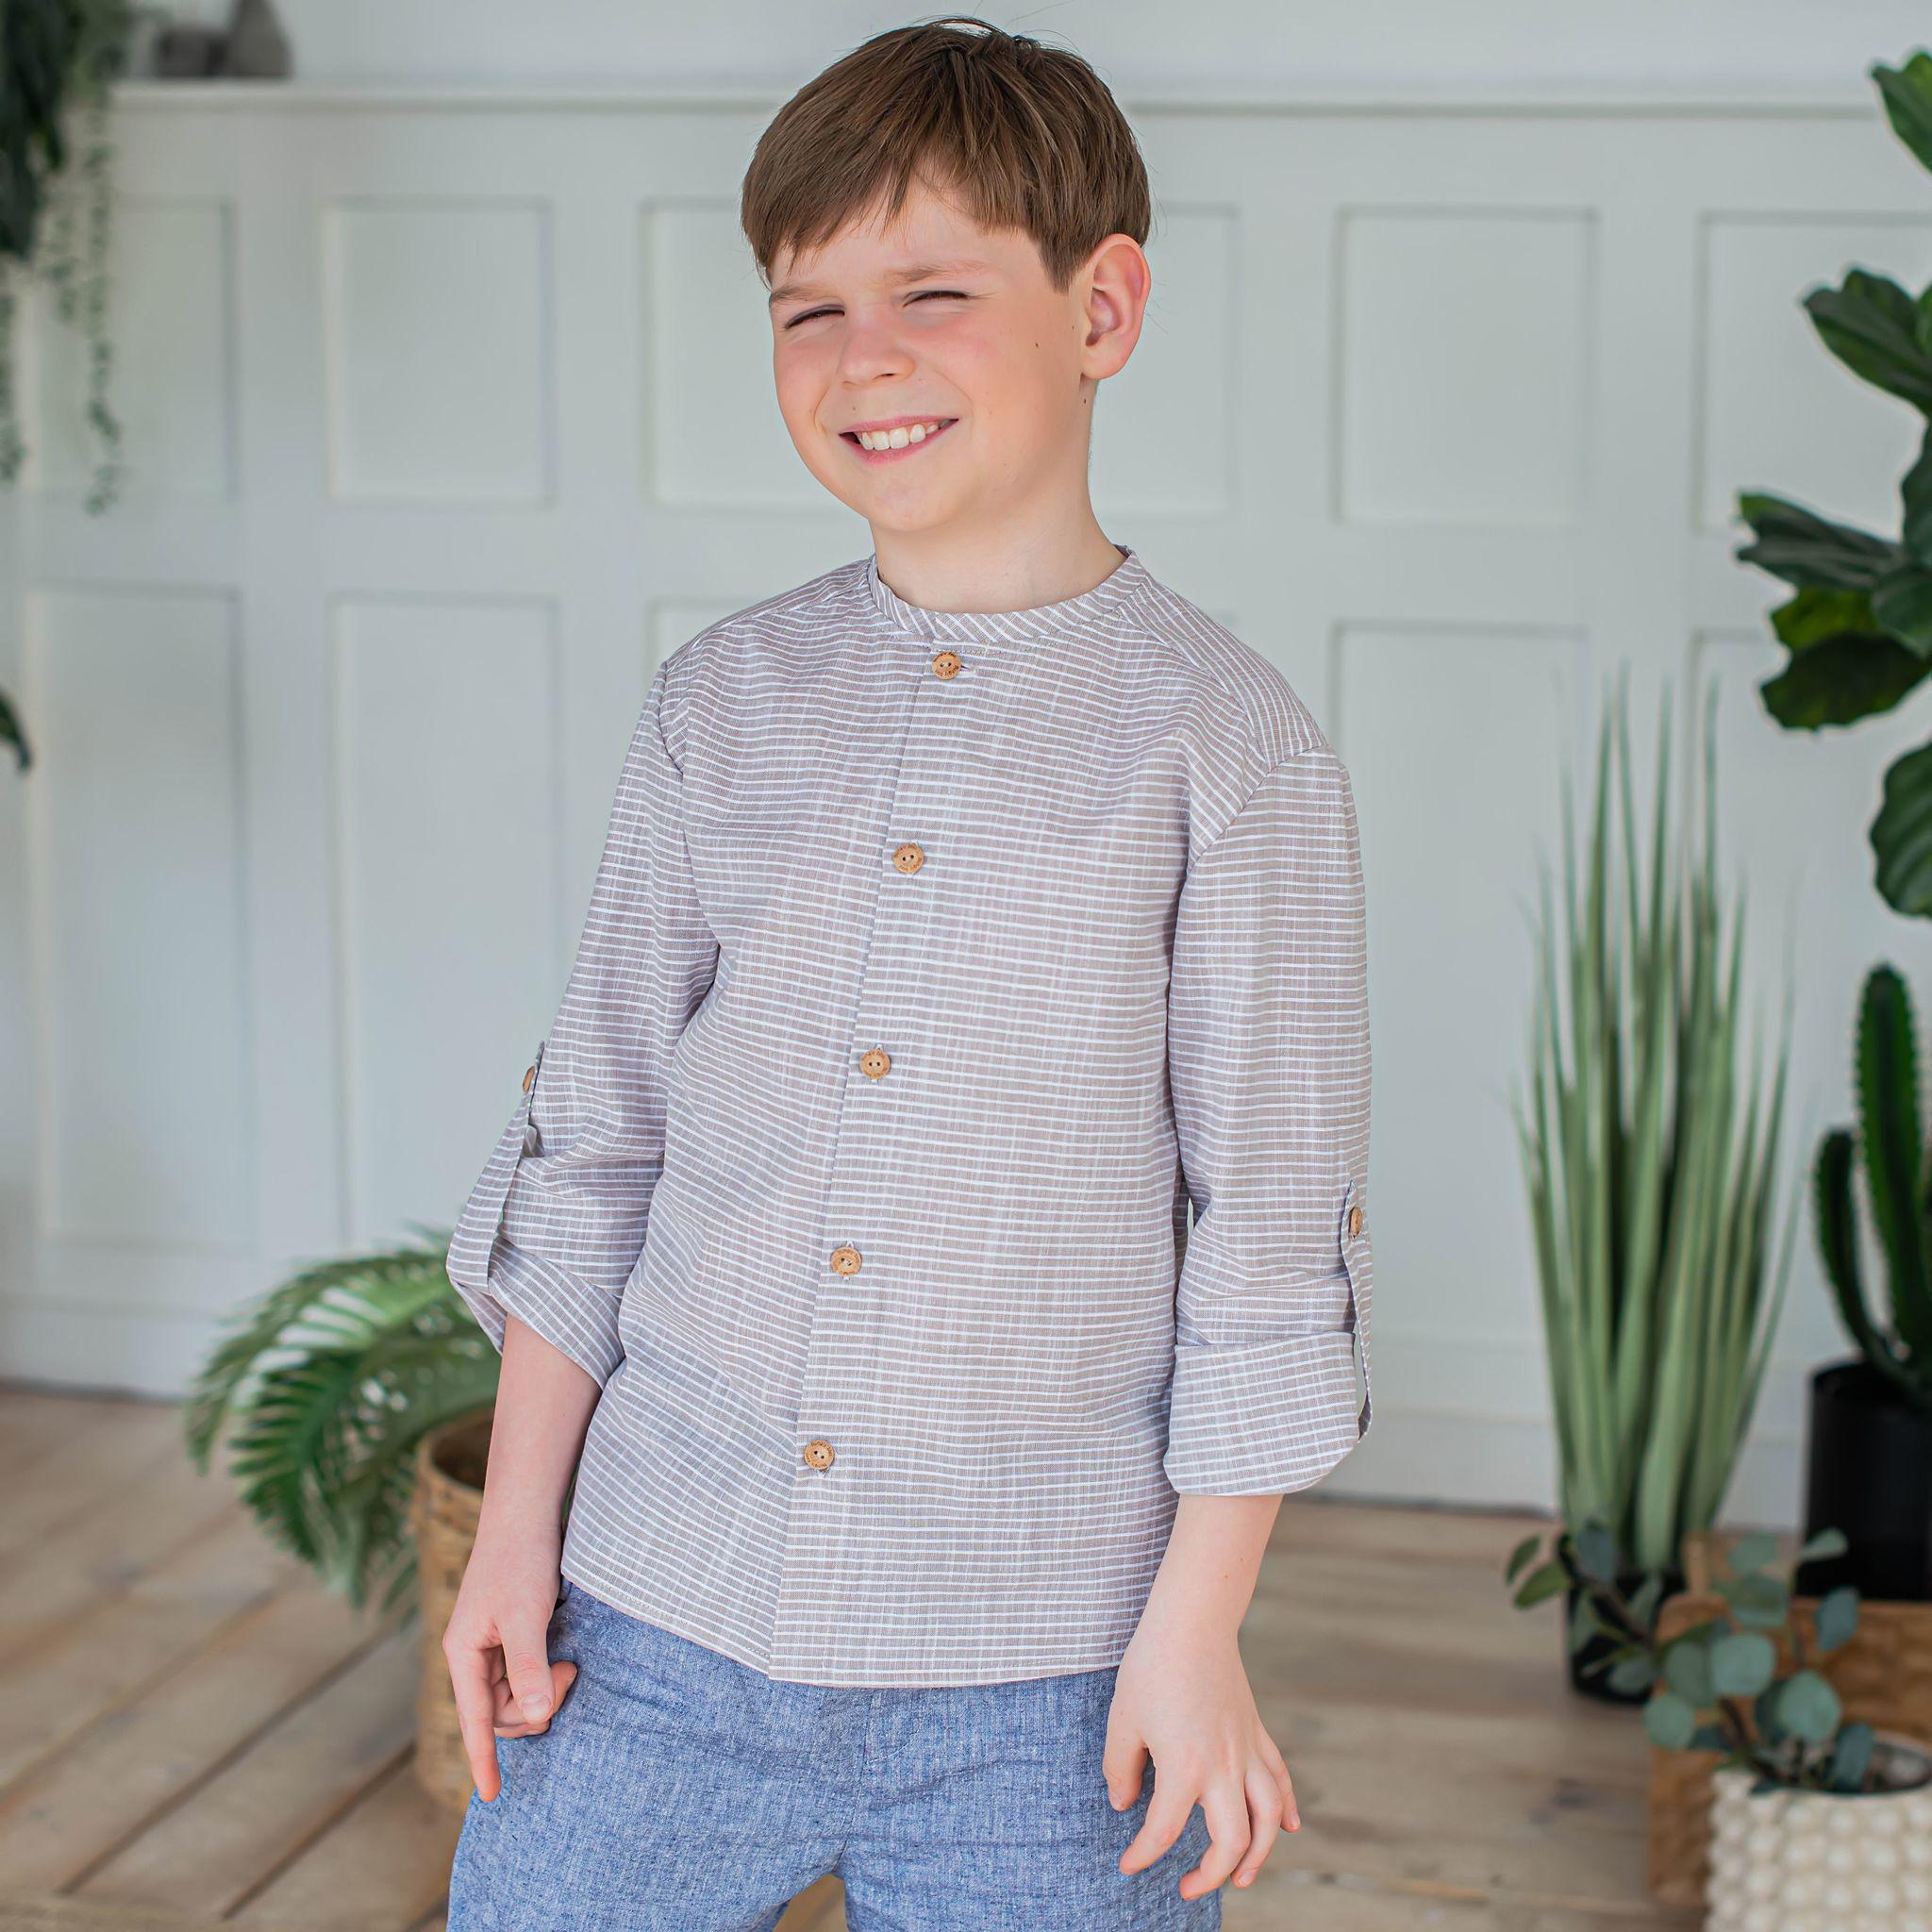 Сhecked сotton shirt for teens - Desert Sand